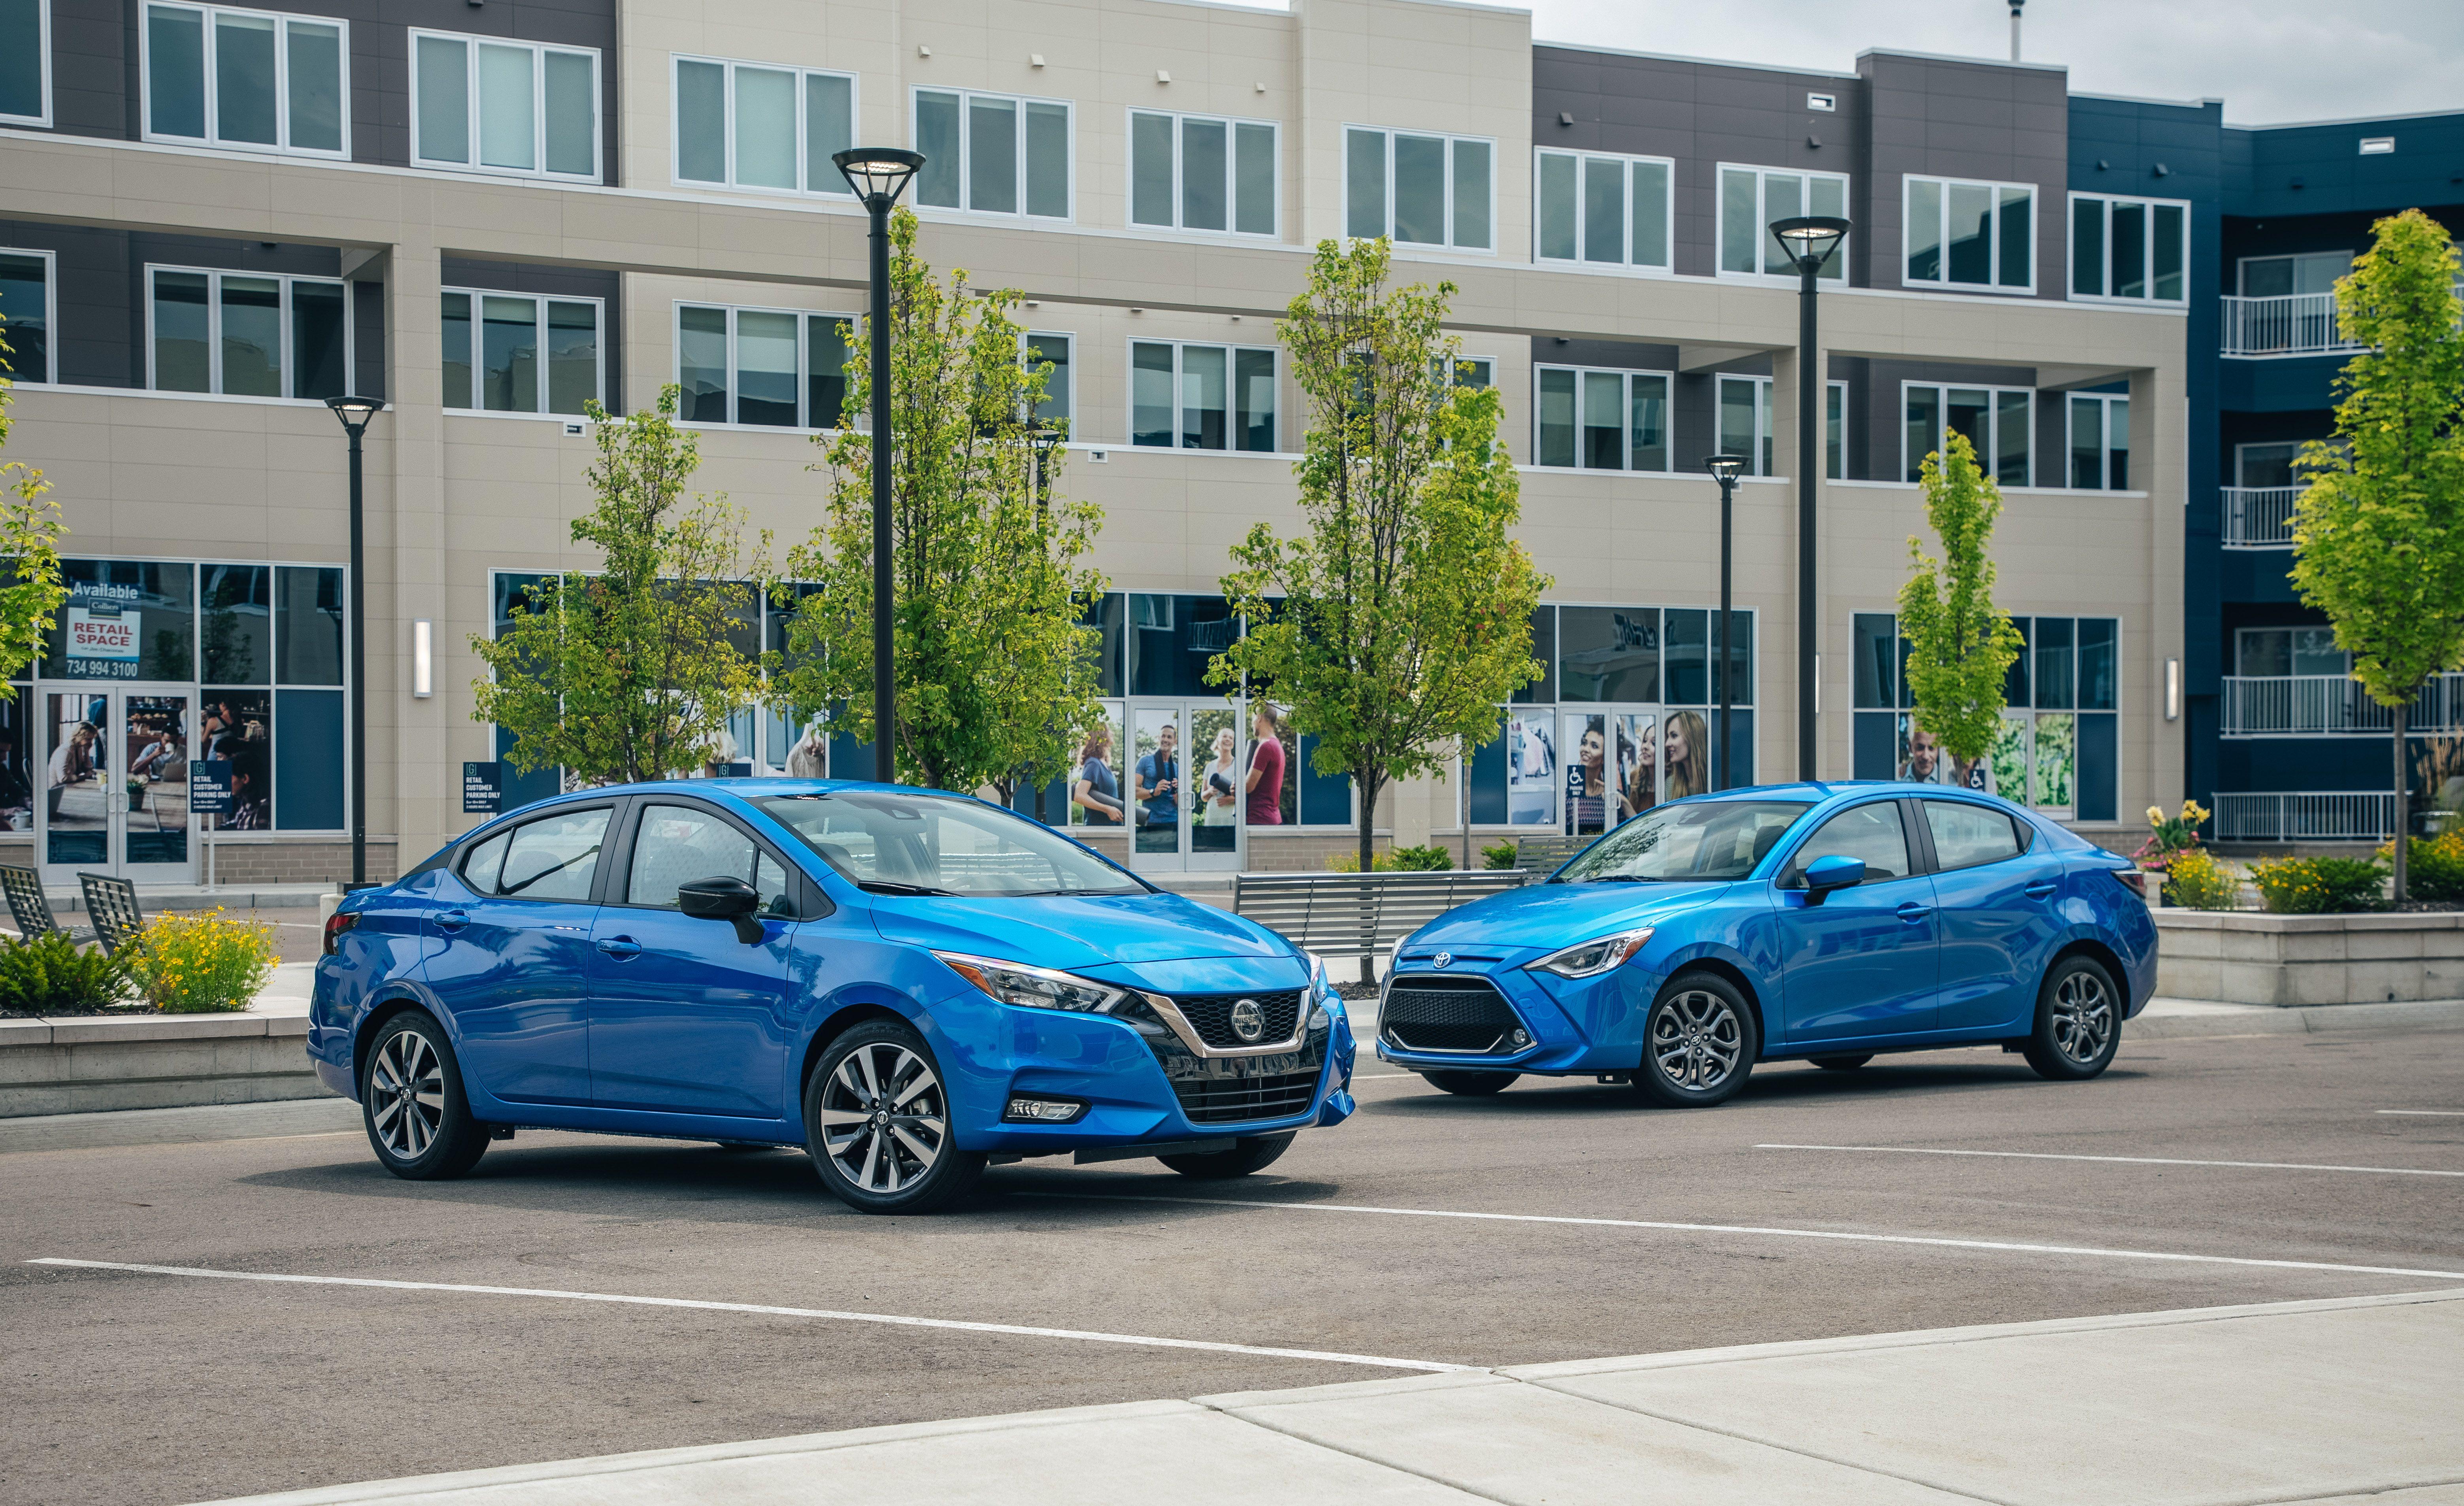 2020 Nissan Versa Vs 2019 Toyota Yaris